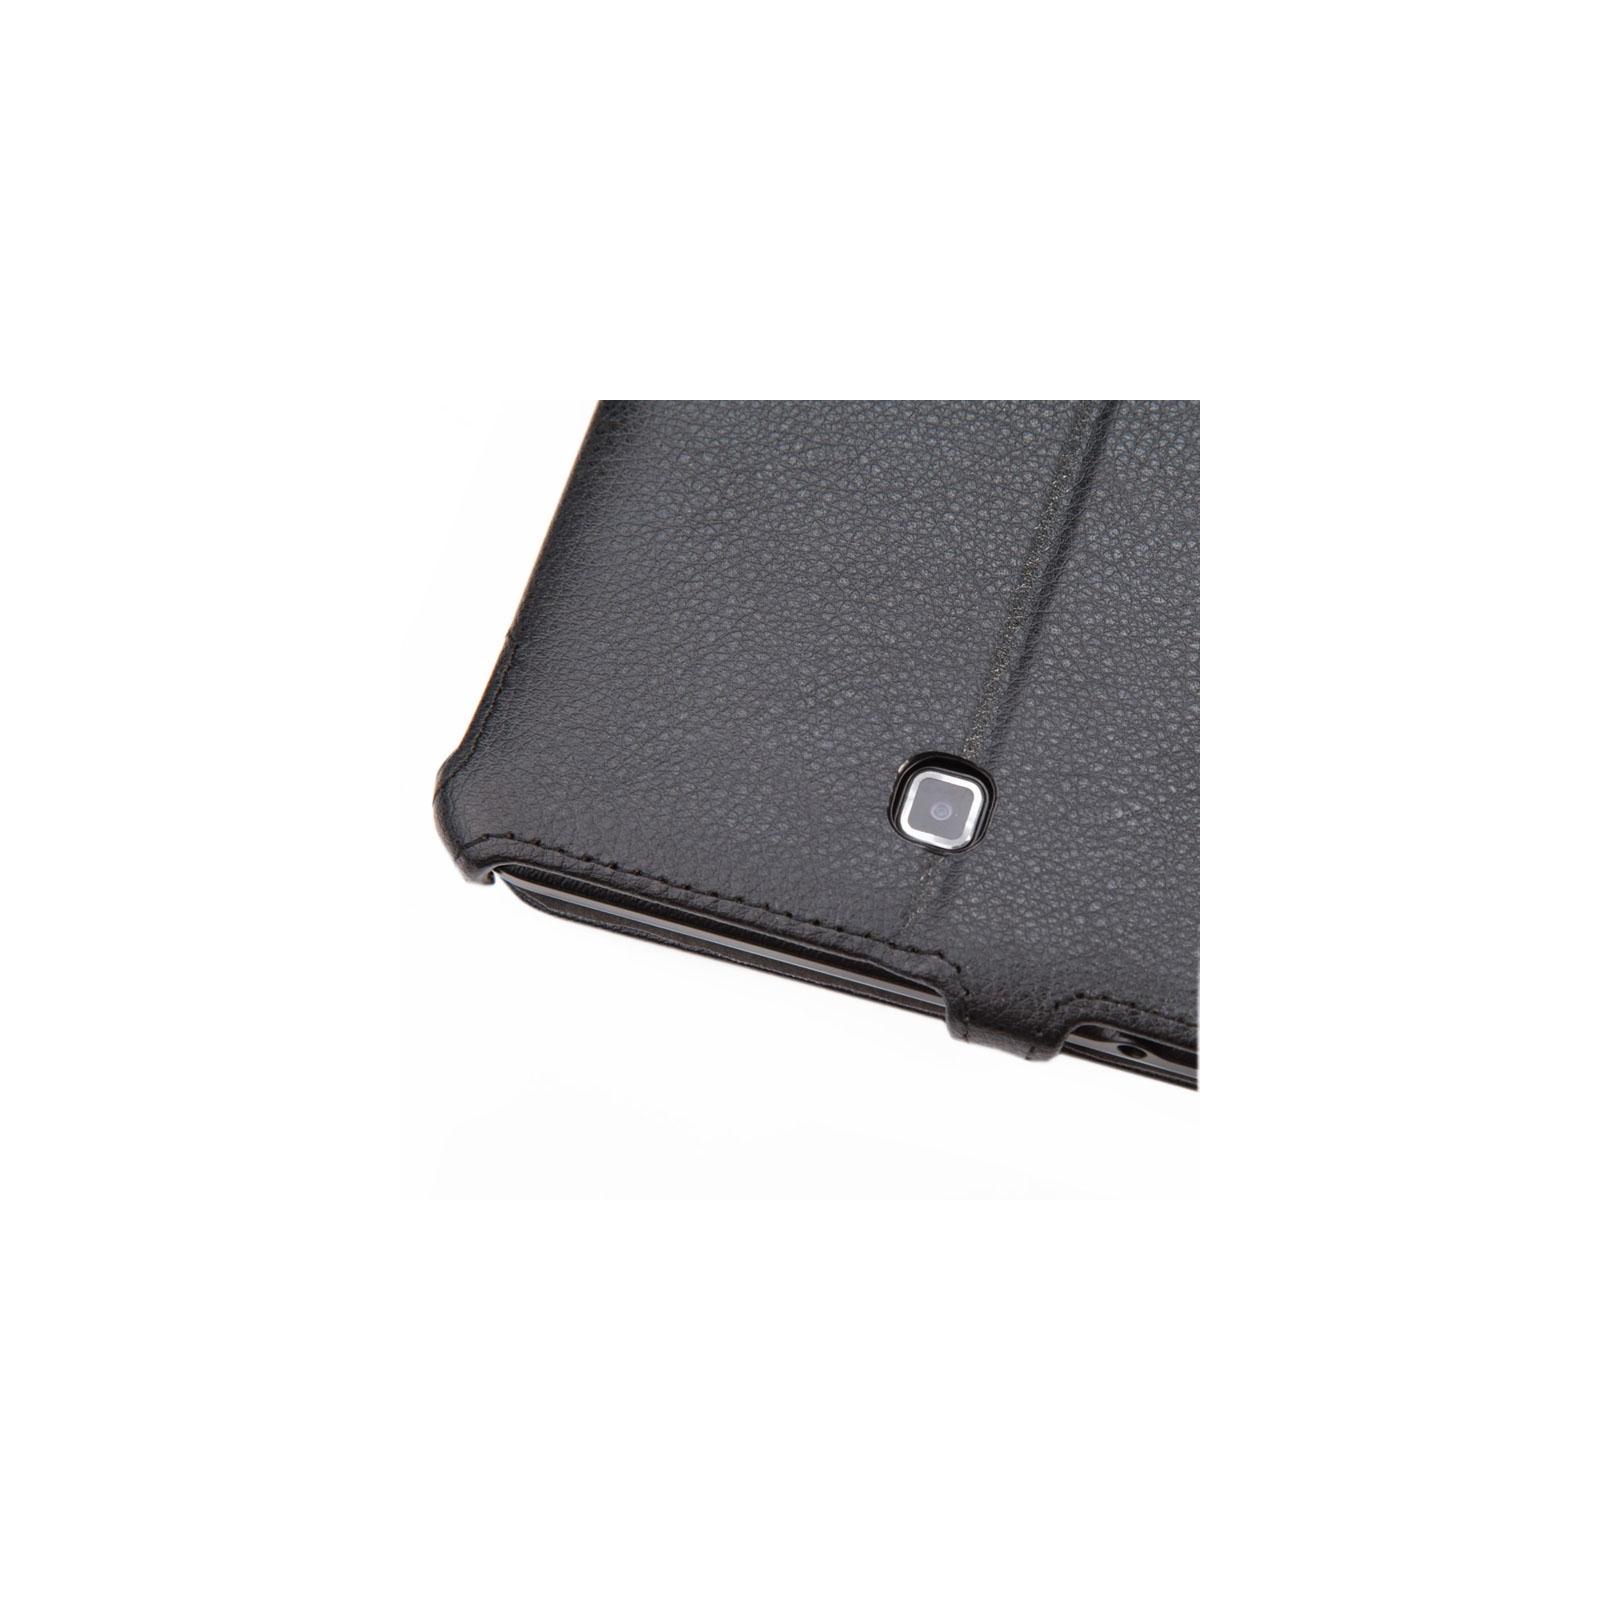 Чехол для планшета AirOn для Samsung GALAXY Tab 4 8.0 black (6946795850168) изображение 4